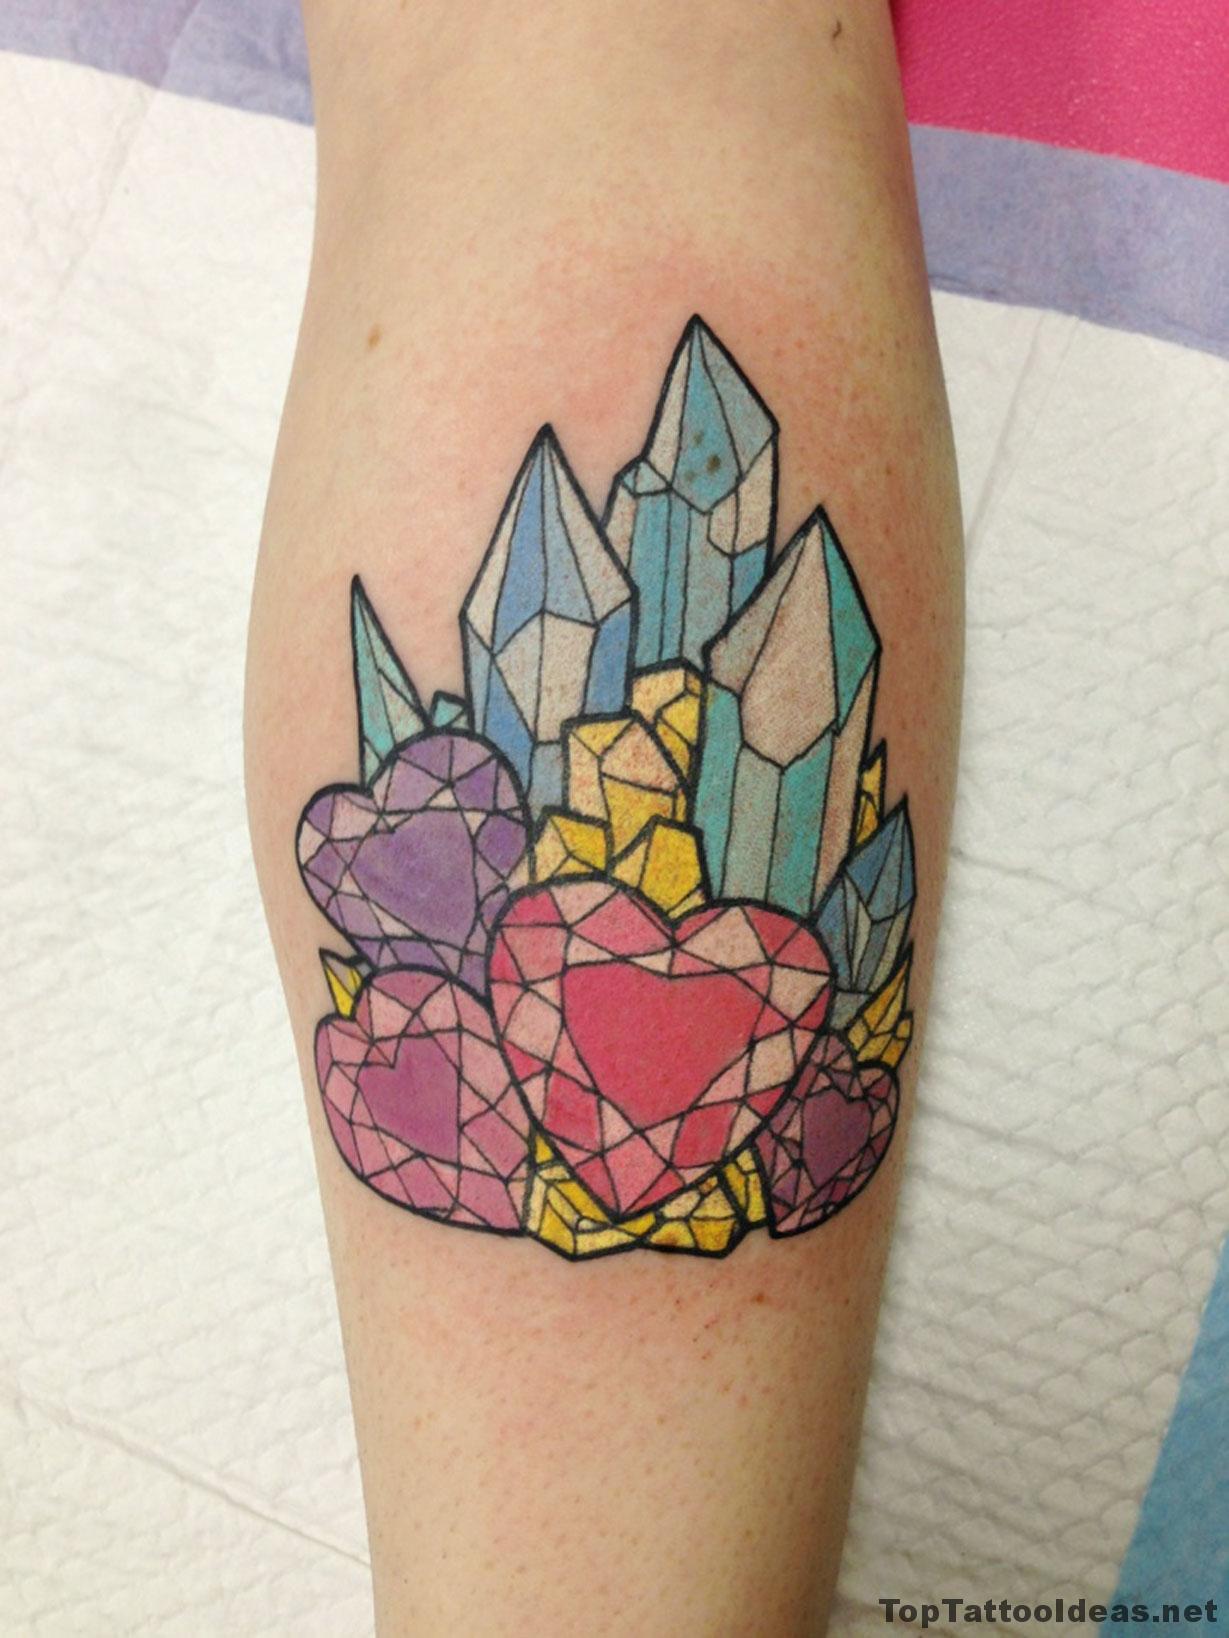 Crystals Tattoo Idea